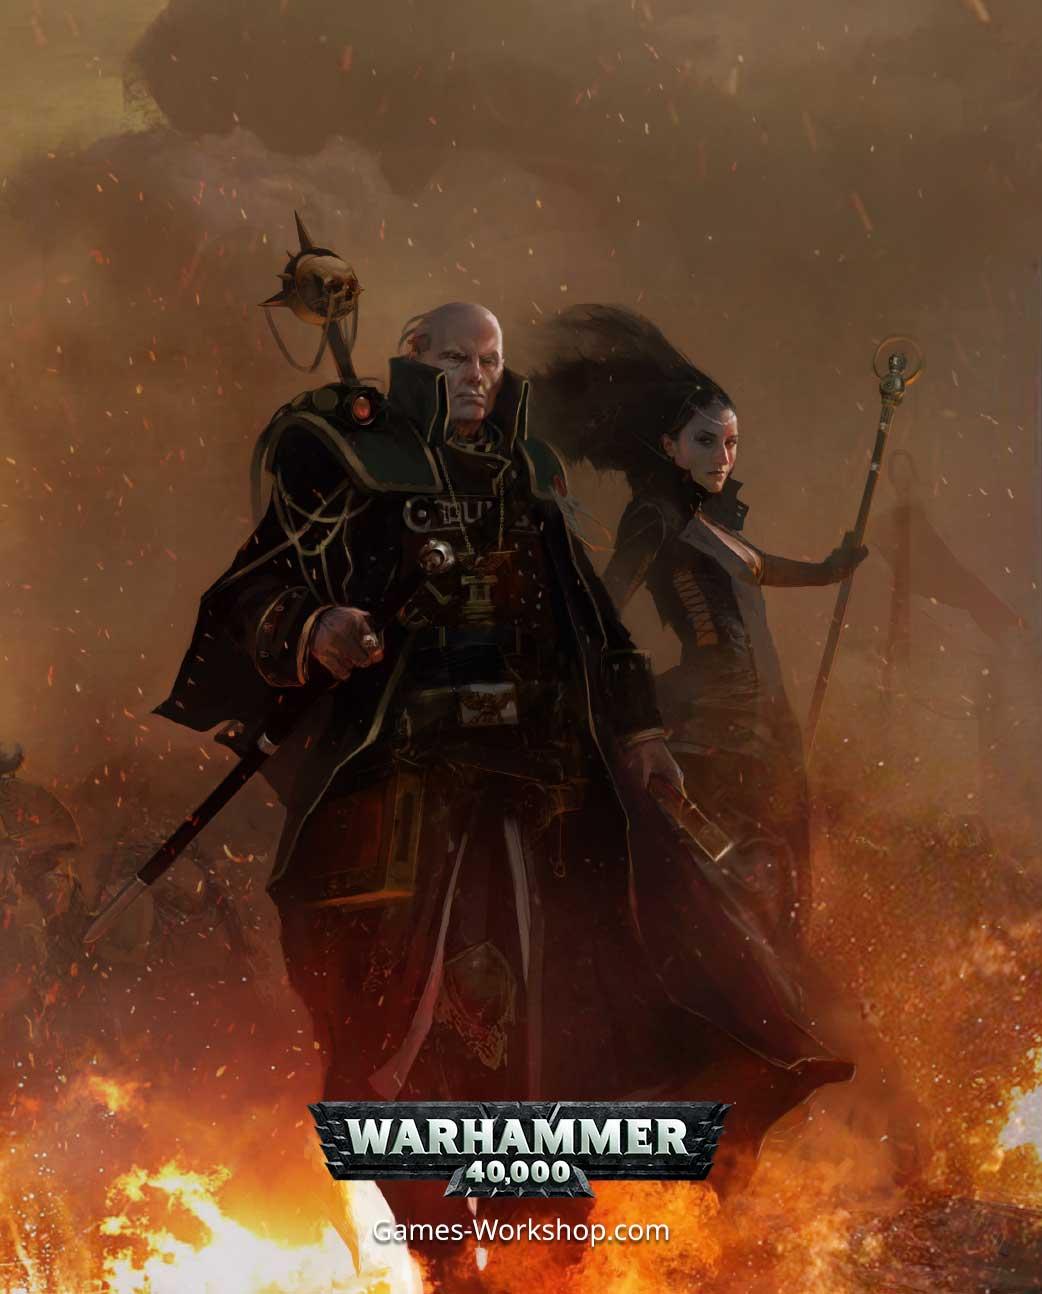 artwork of Warhammer 40,000 character Gregor Eisenhorn